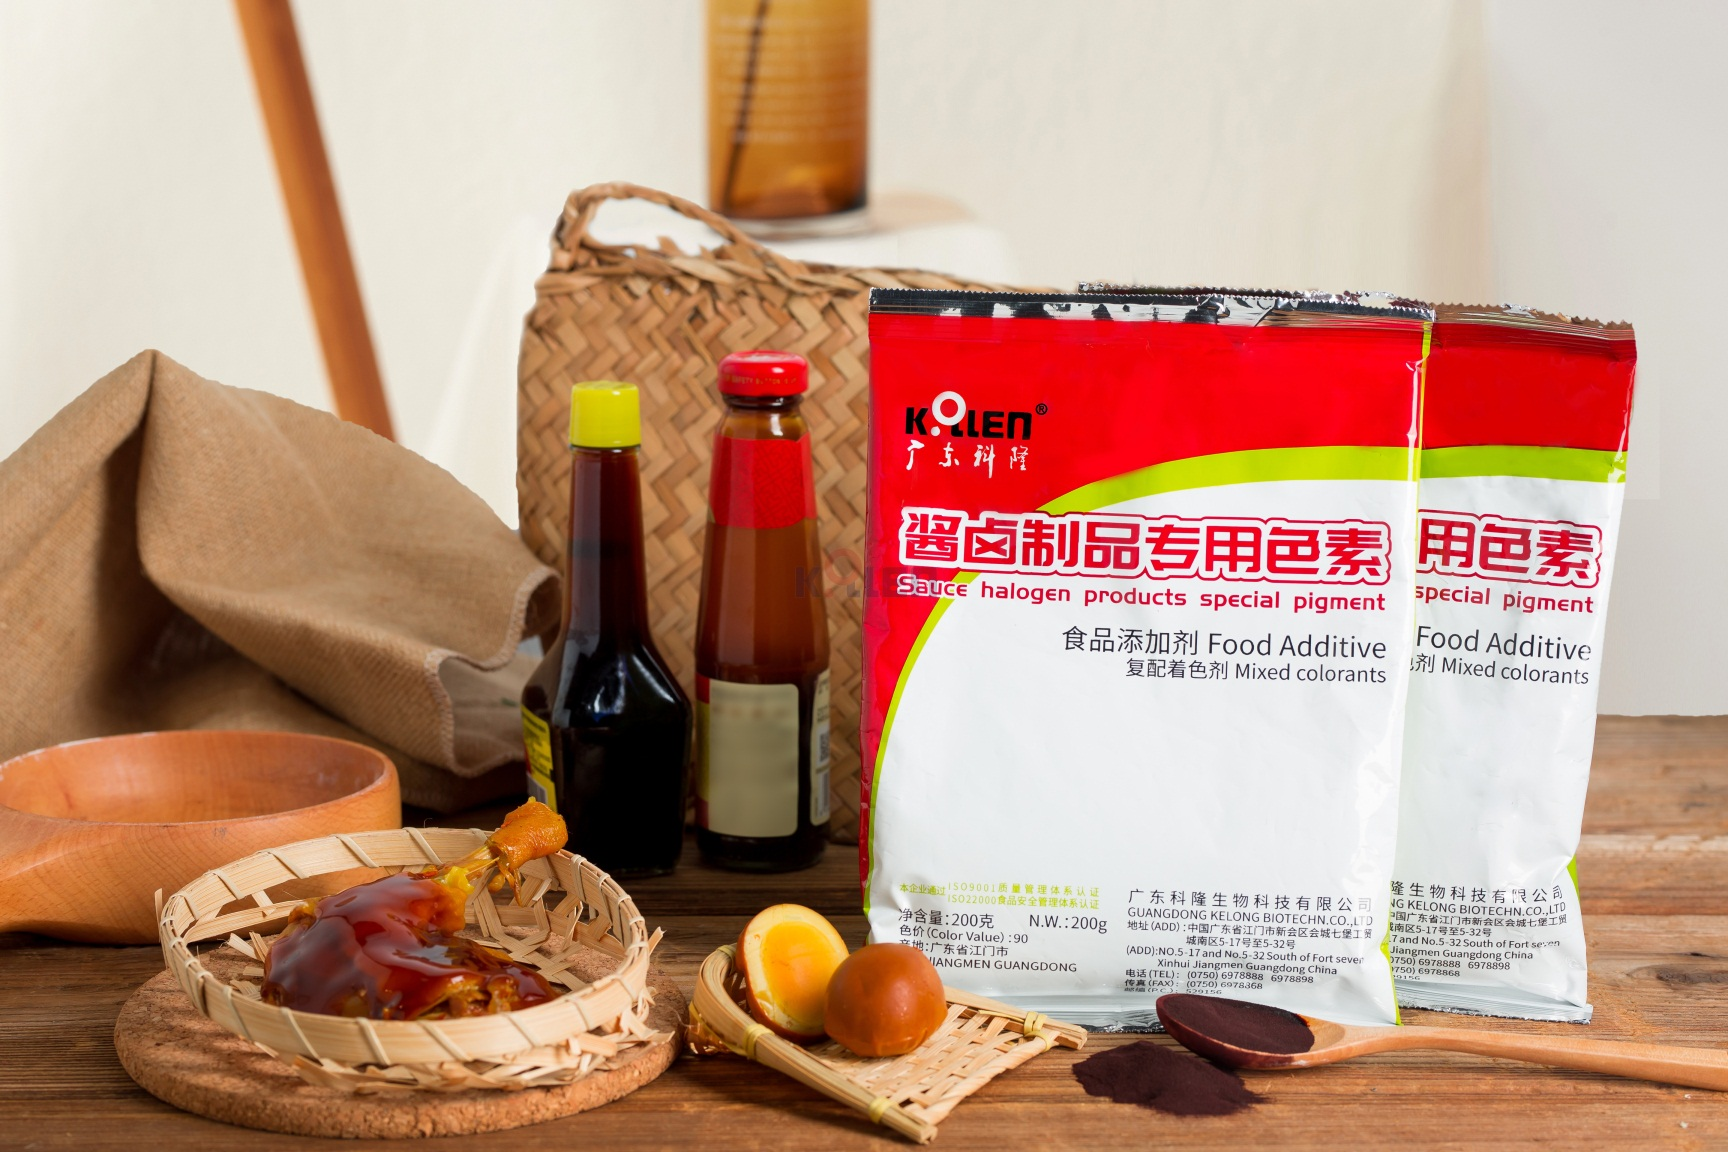 The Sauce&Brine Special Pigment